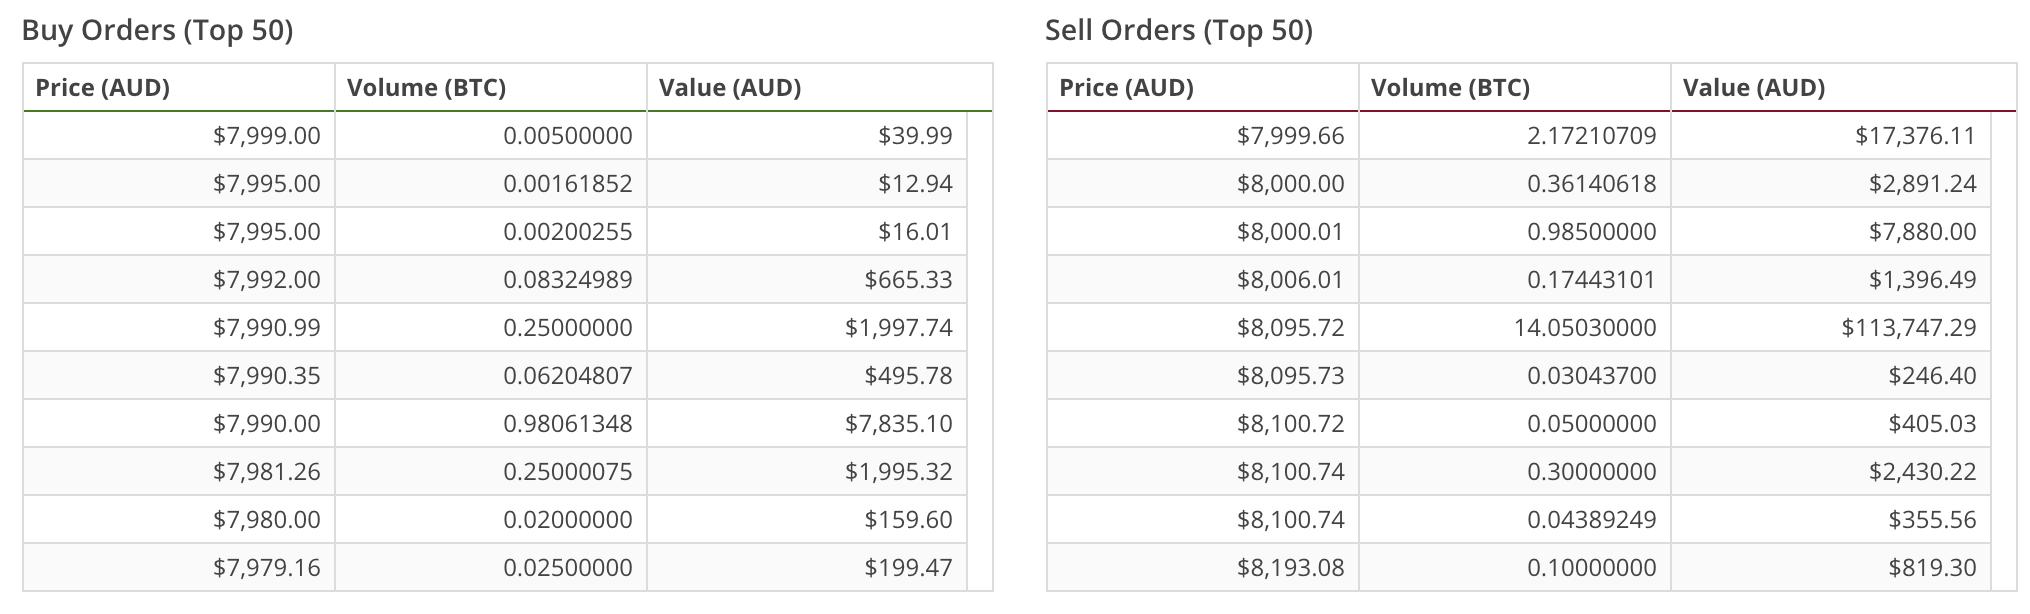 BTC order book 6 Feb 2018